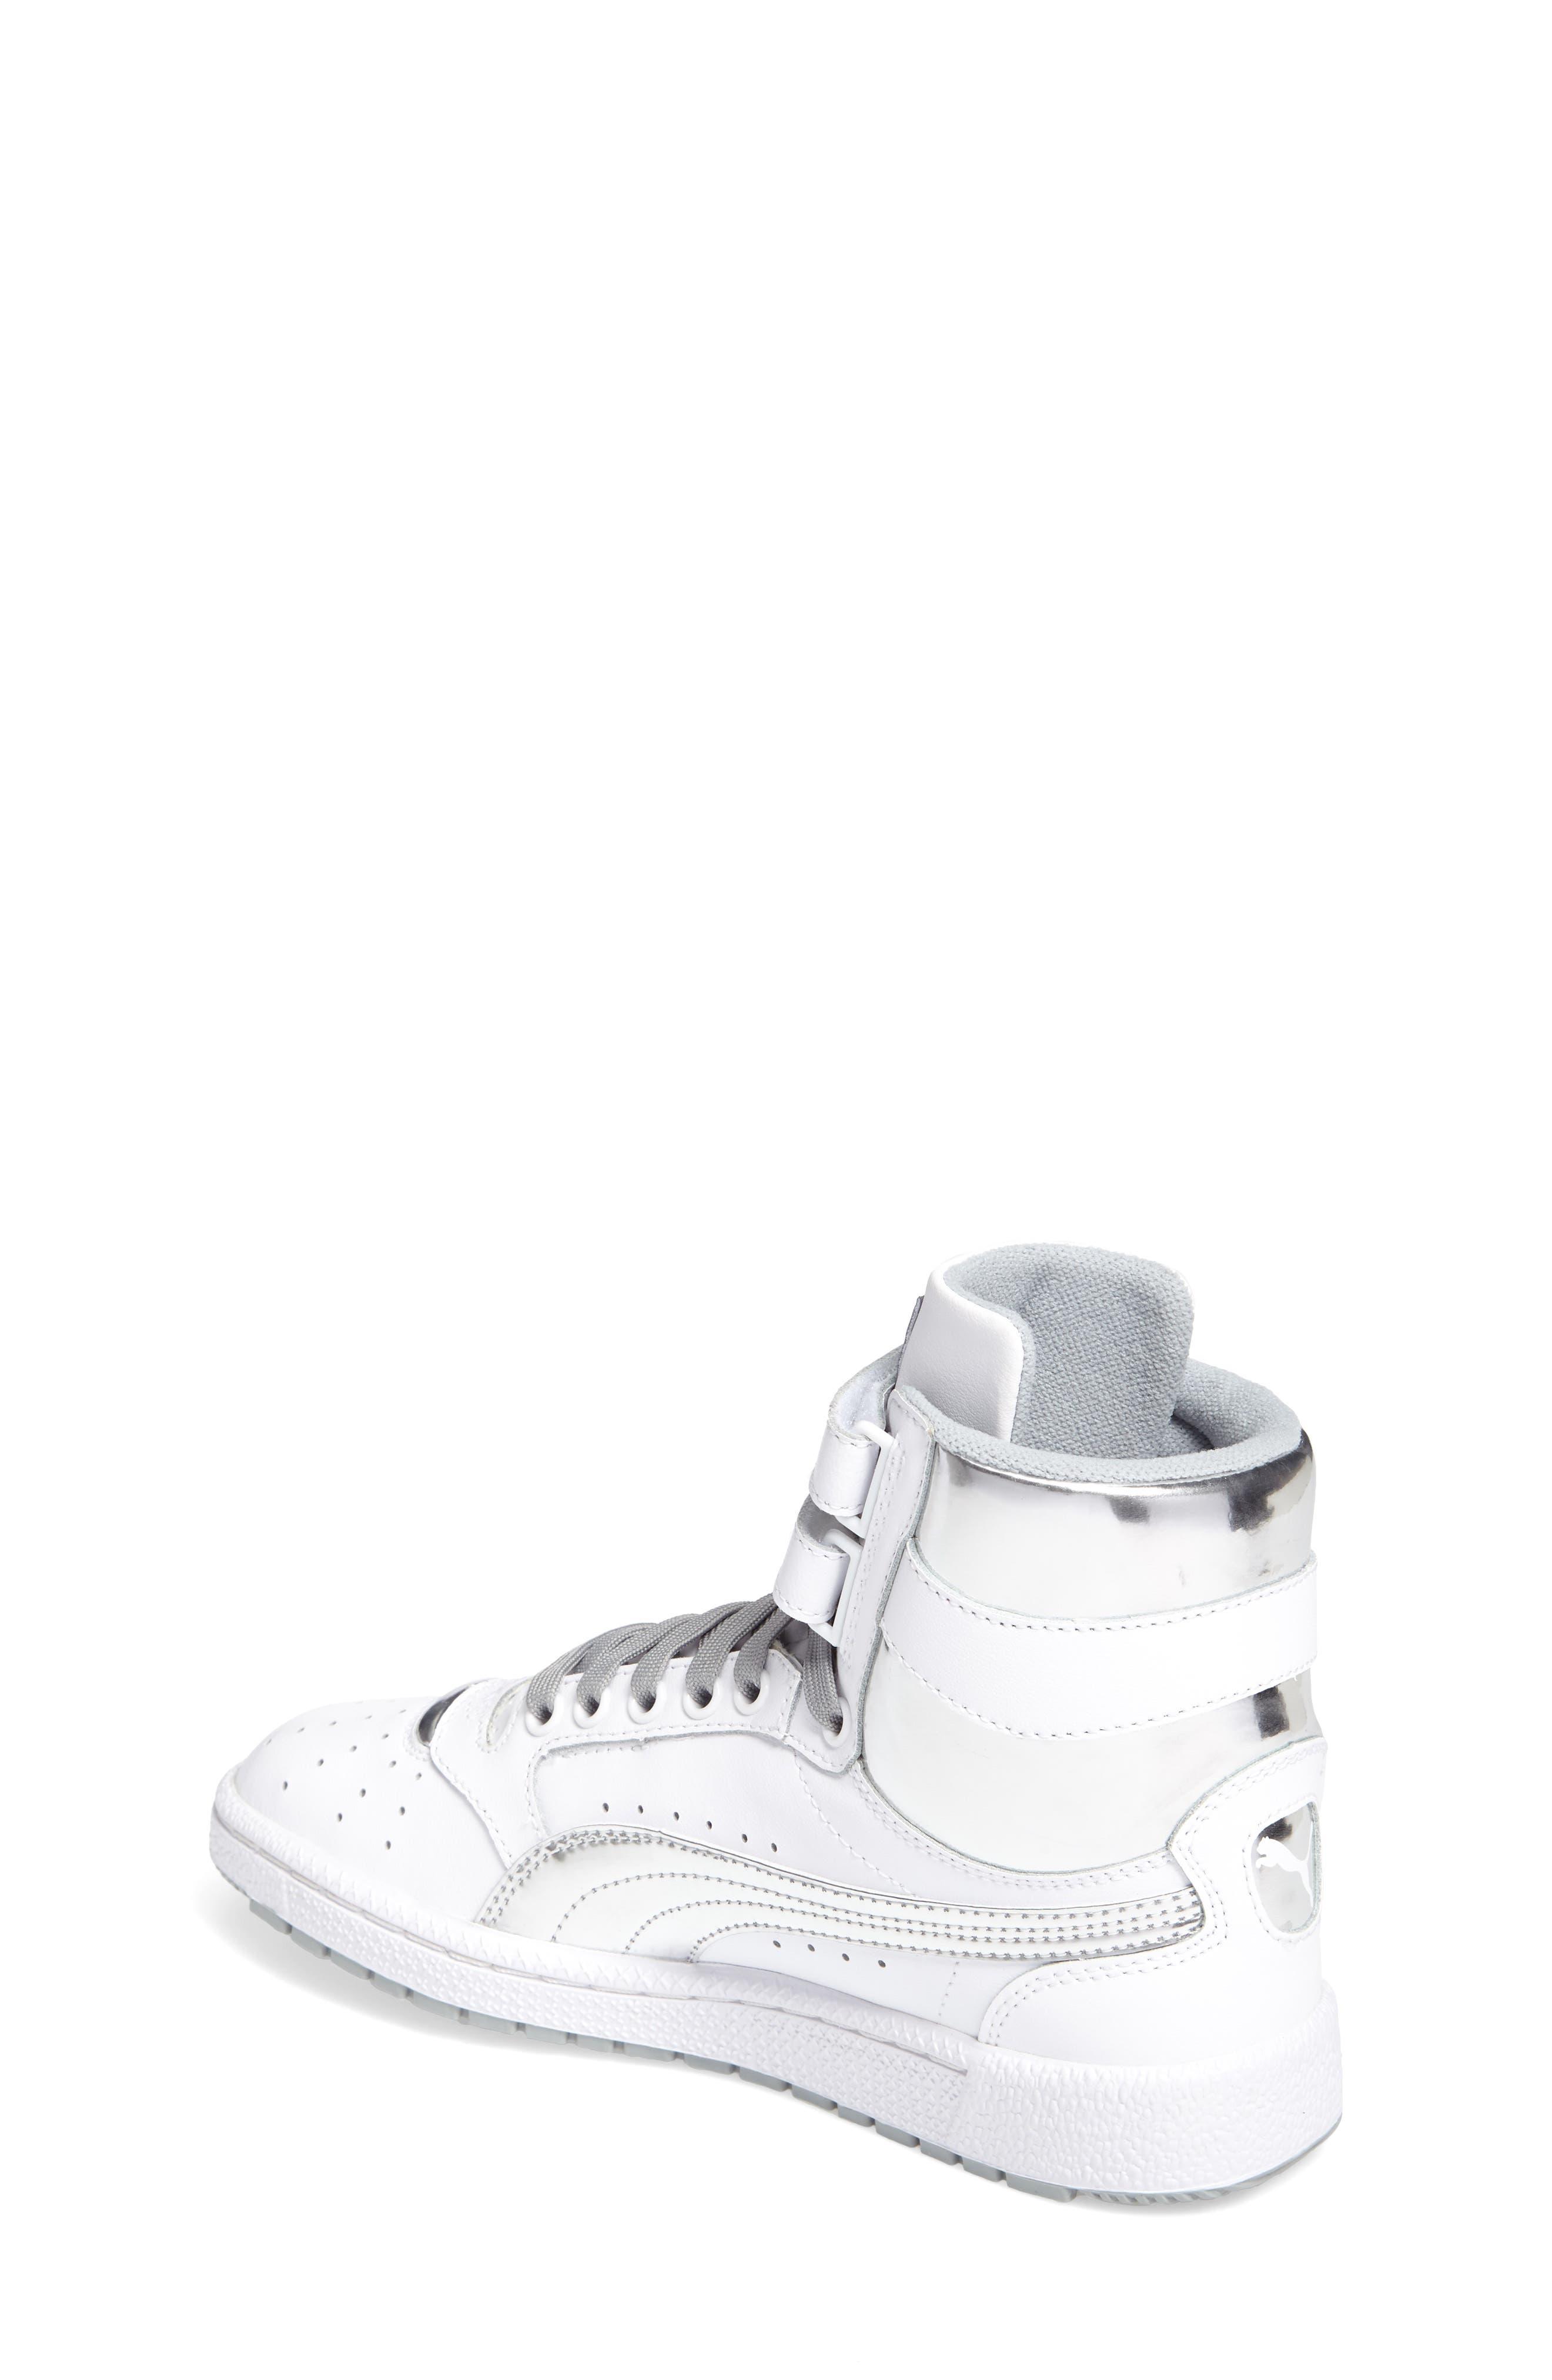 Sky II Hi Foil Jr Sneaker,                             Alternate thumbnail 3, color,                             100